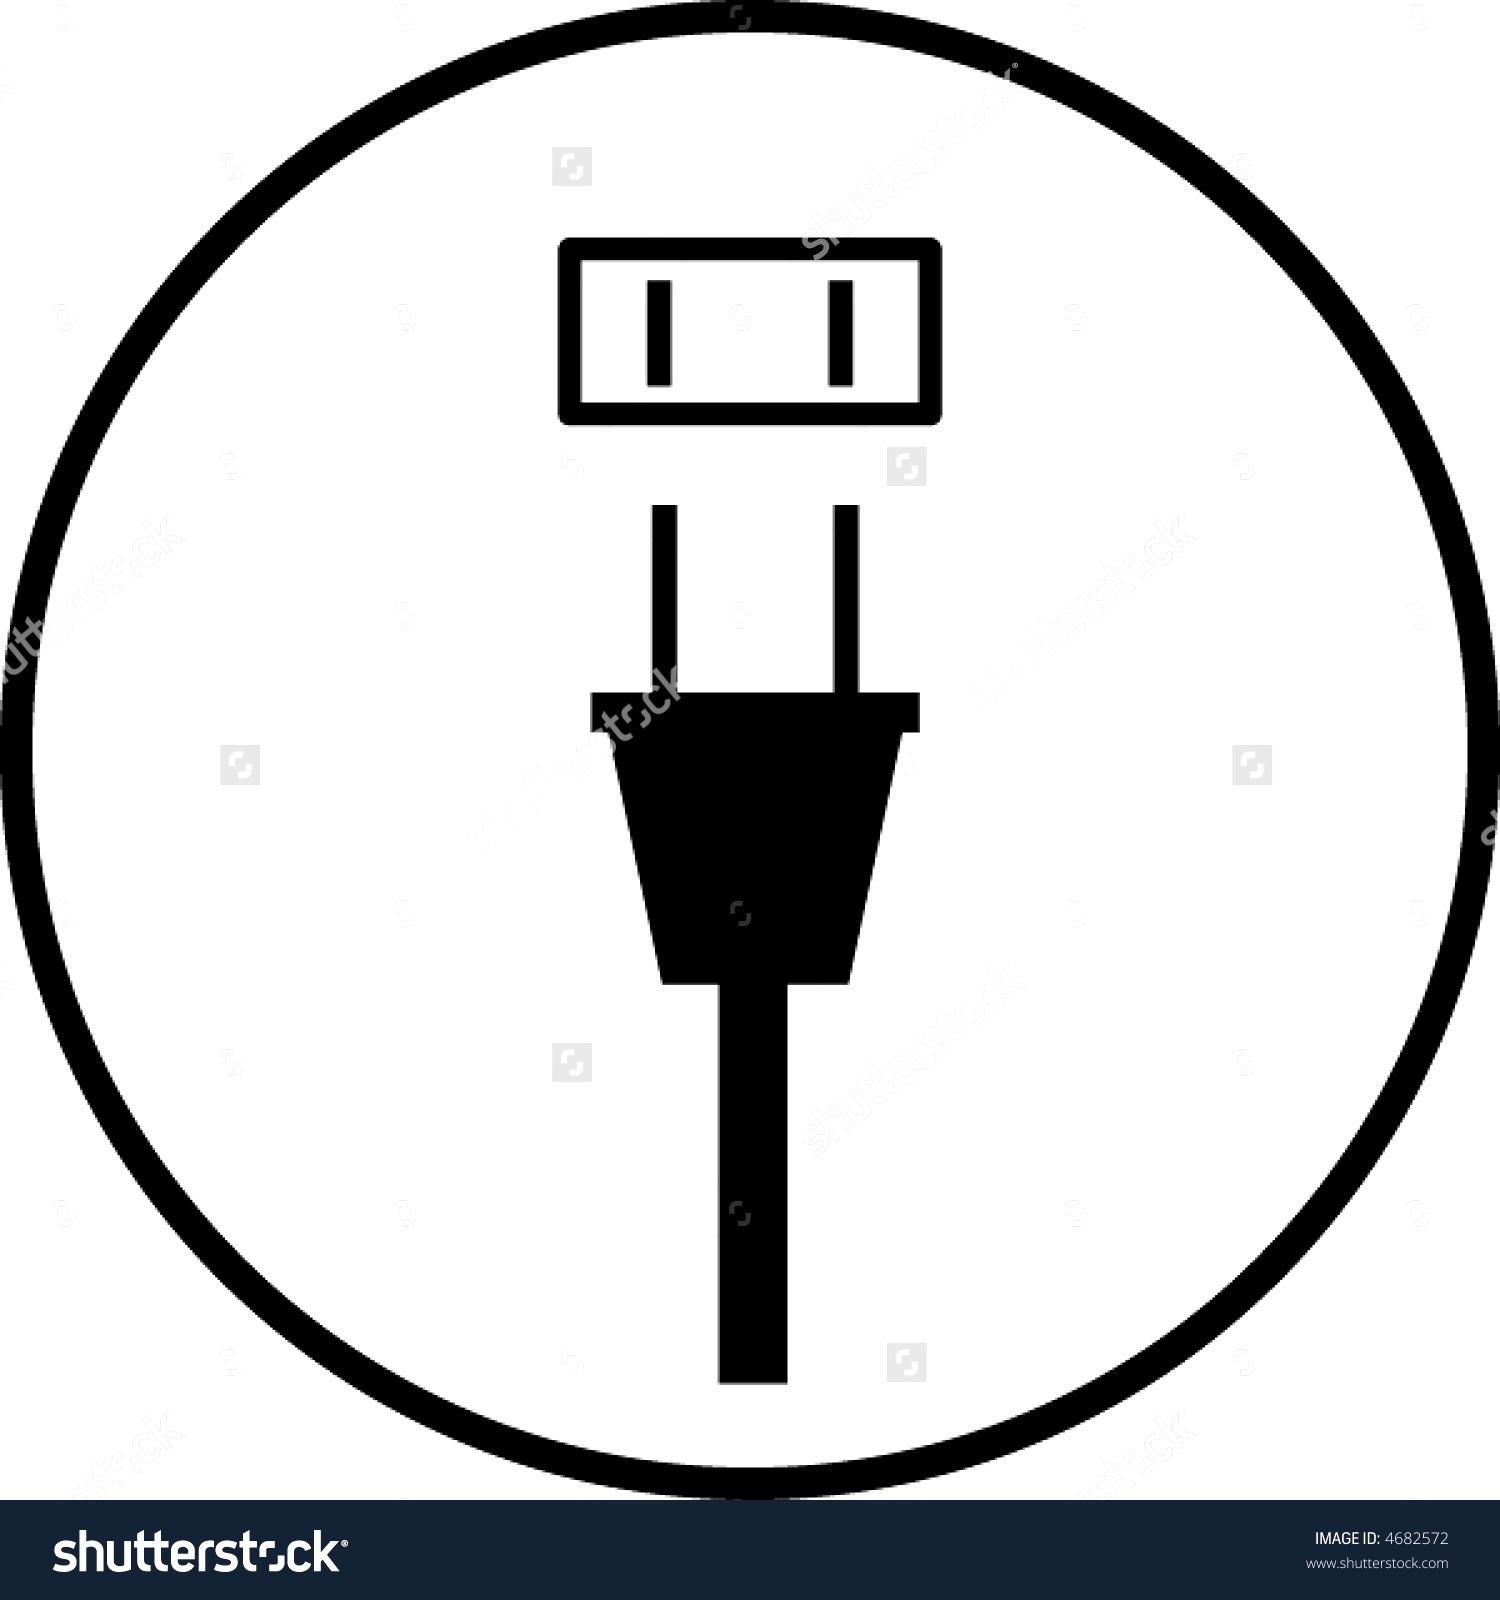 voltmeter symbol clipart best